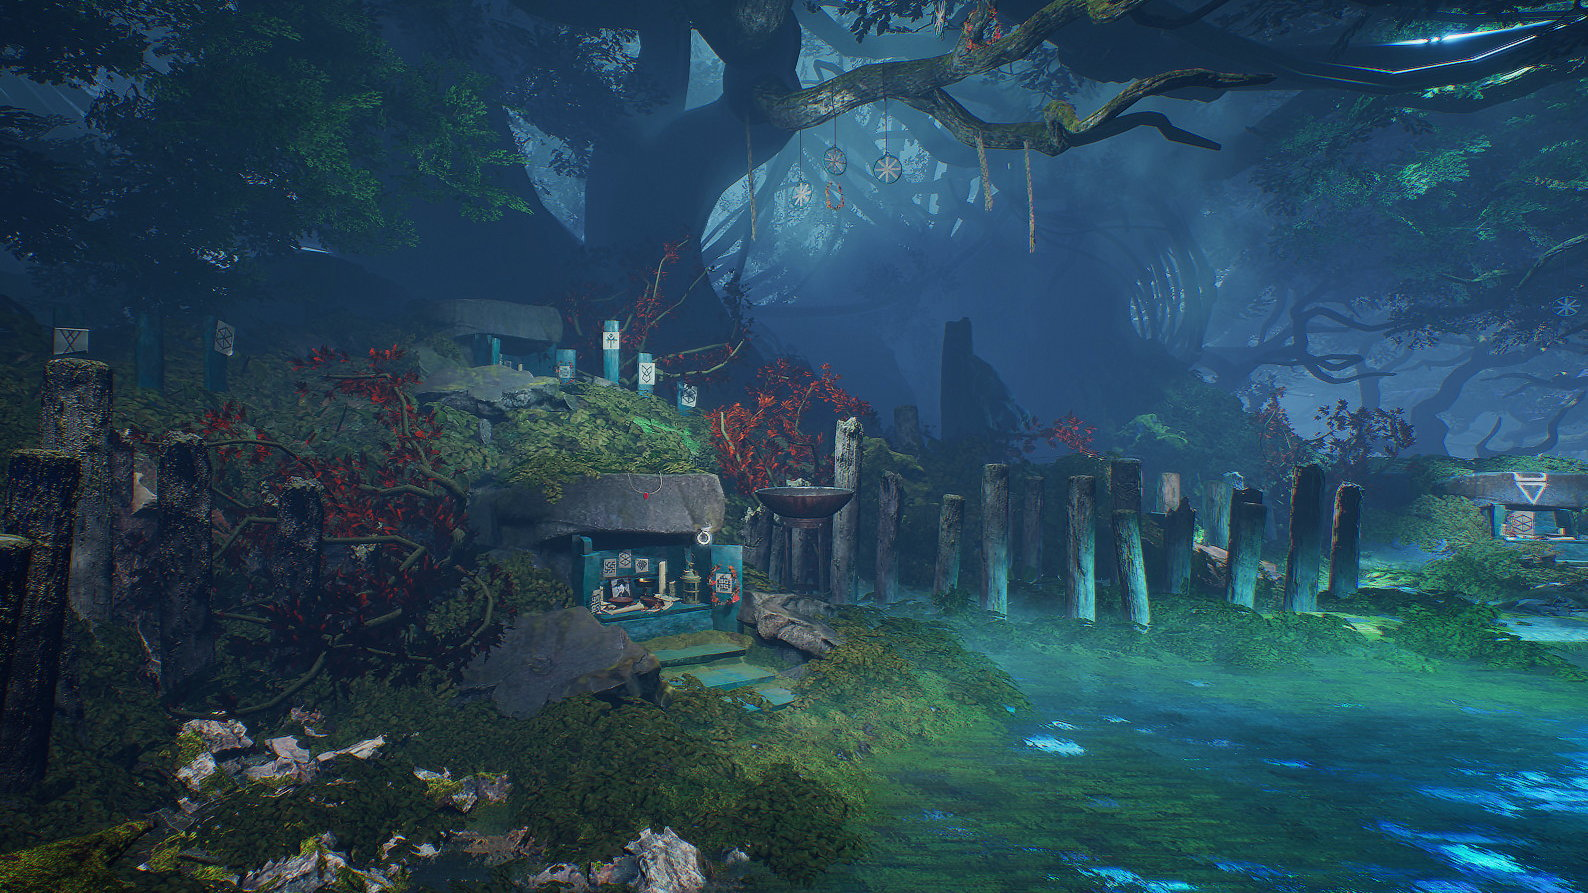 Paradise Lost screenshot.